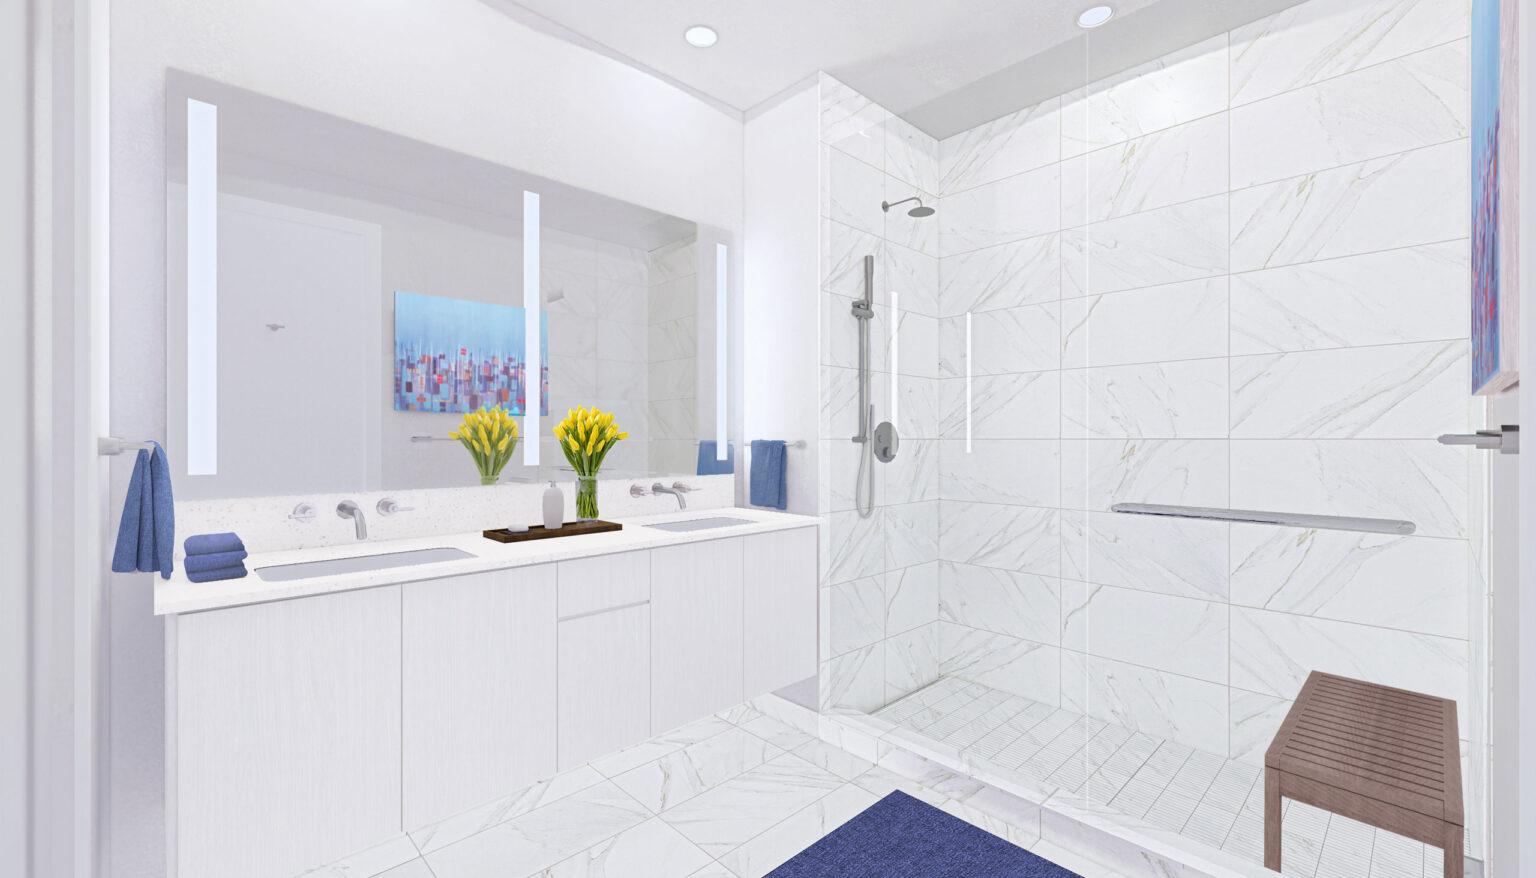 Penthouse B bathroom palette, Minimal White